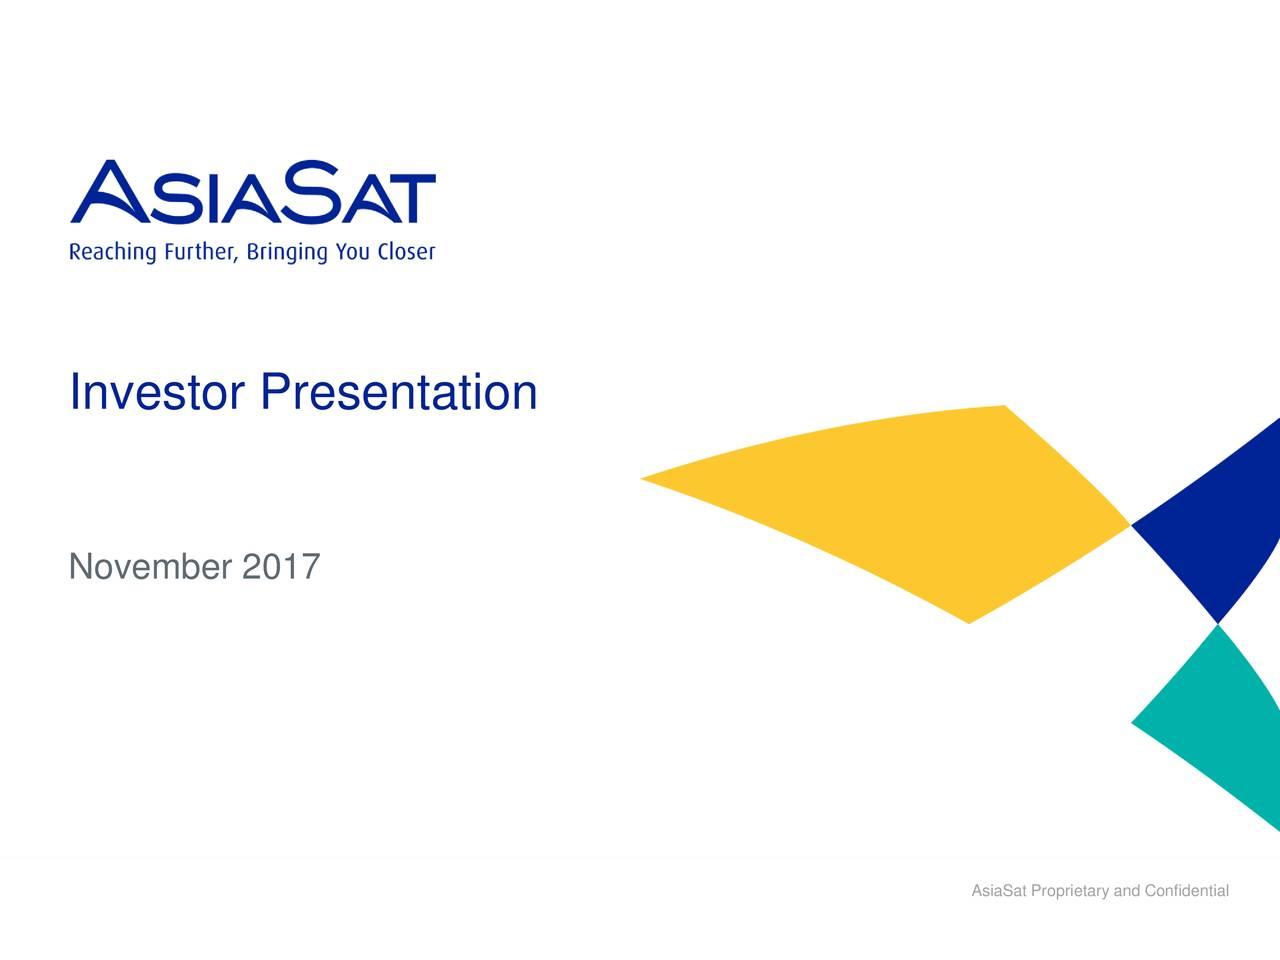 Asia Satellite Telecommunications (AISLF) Presents At